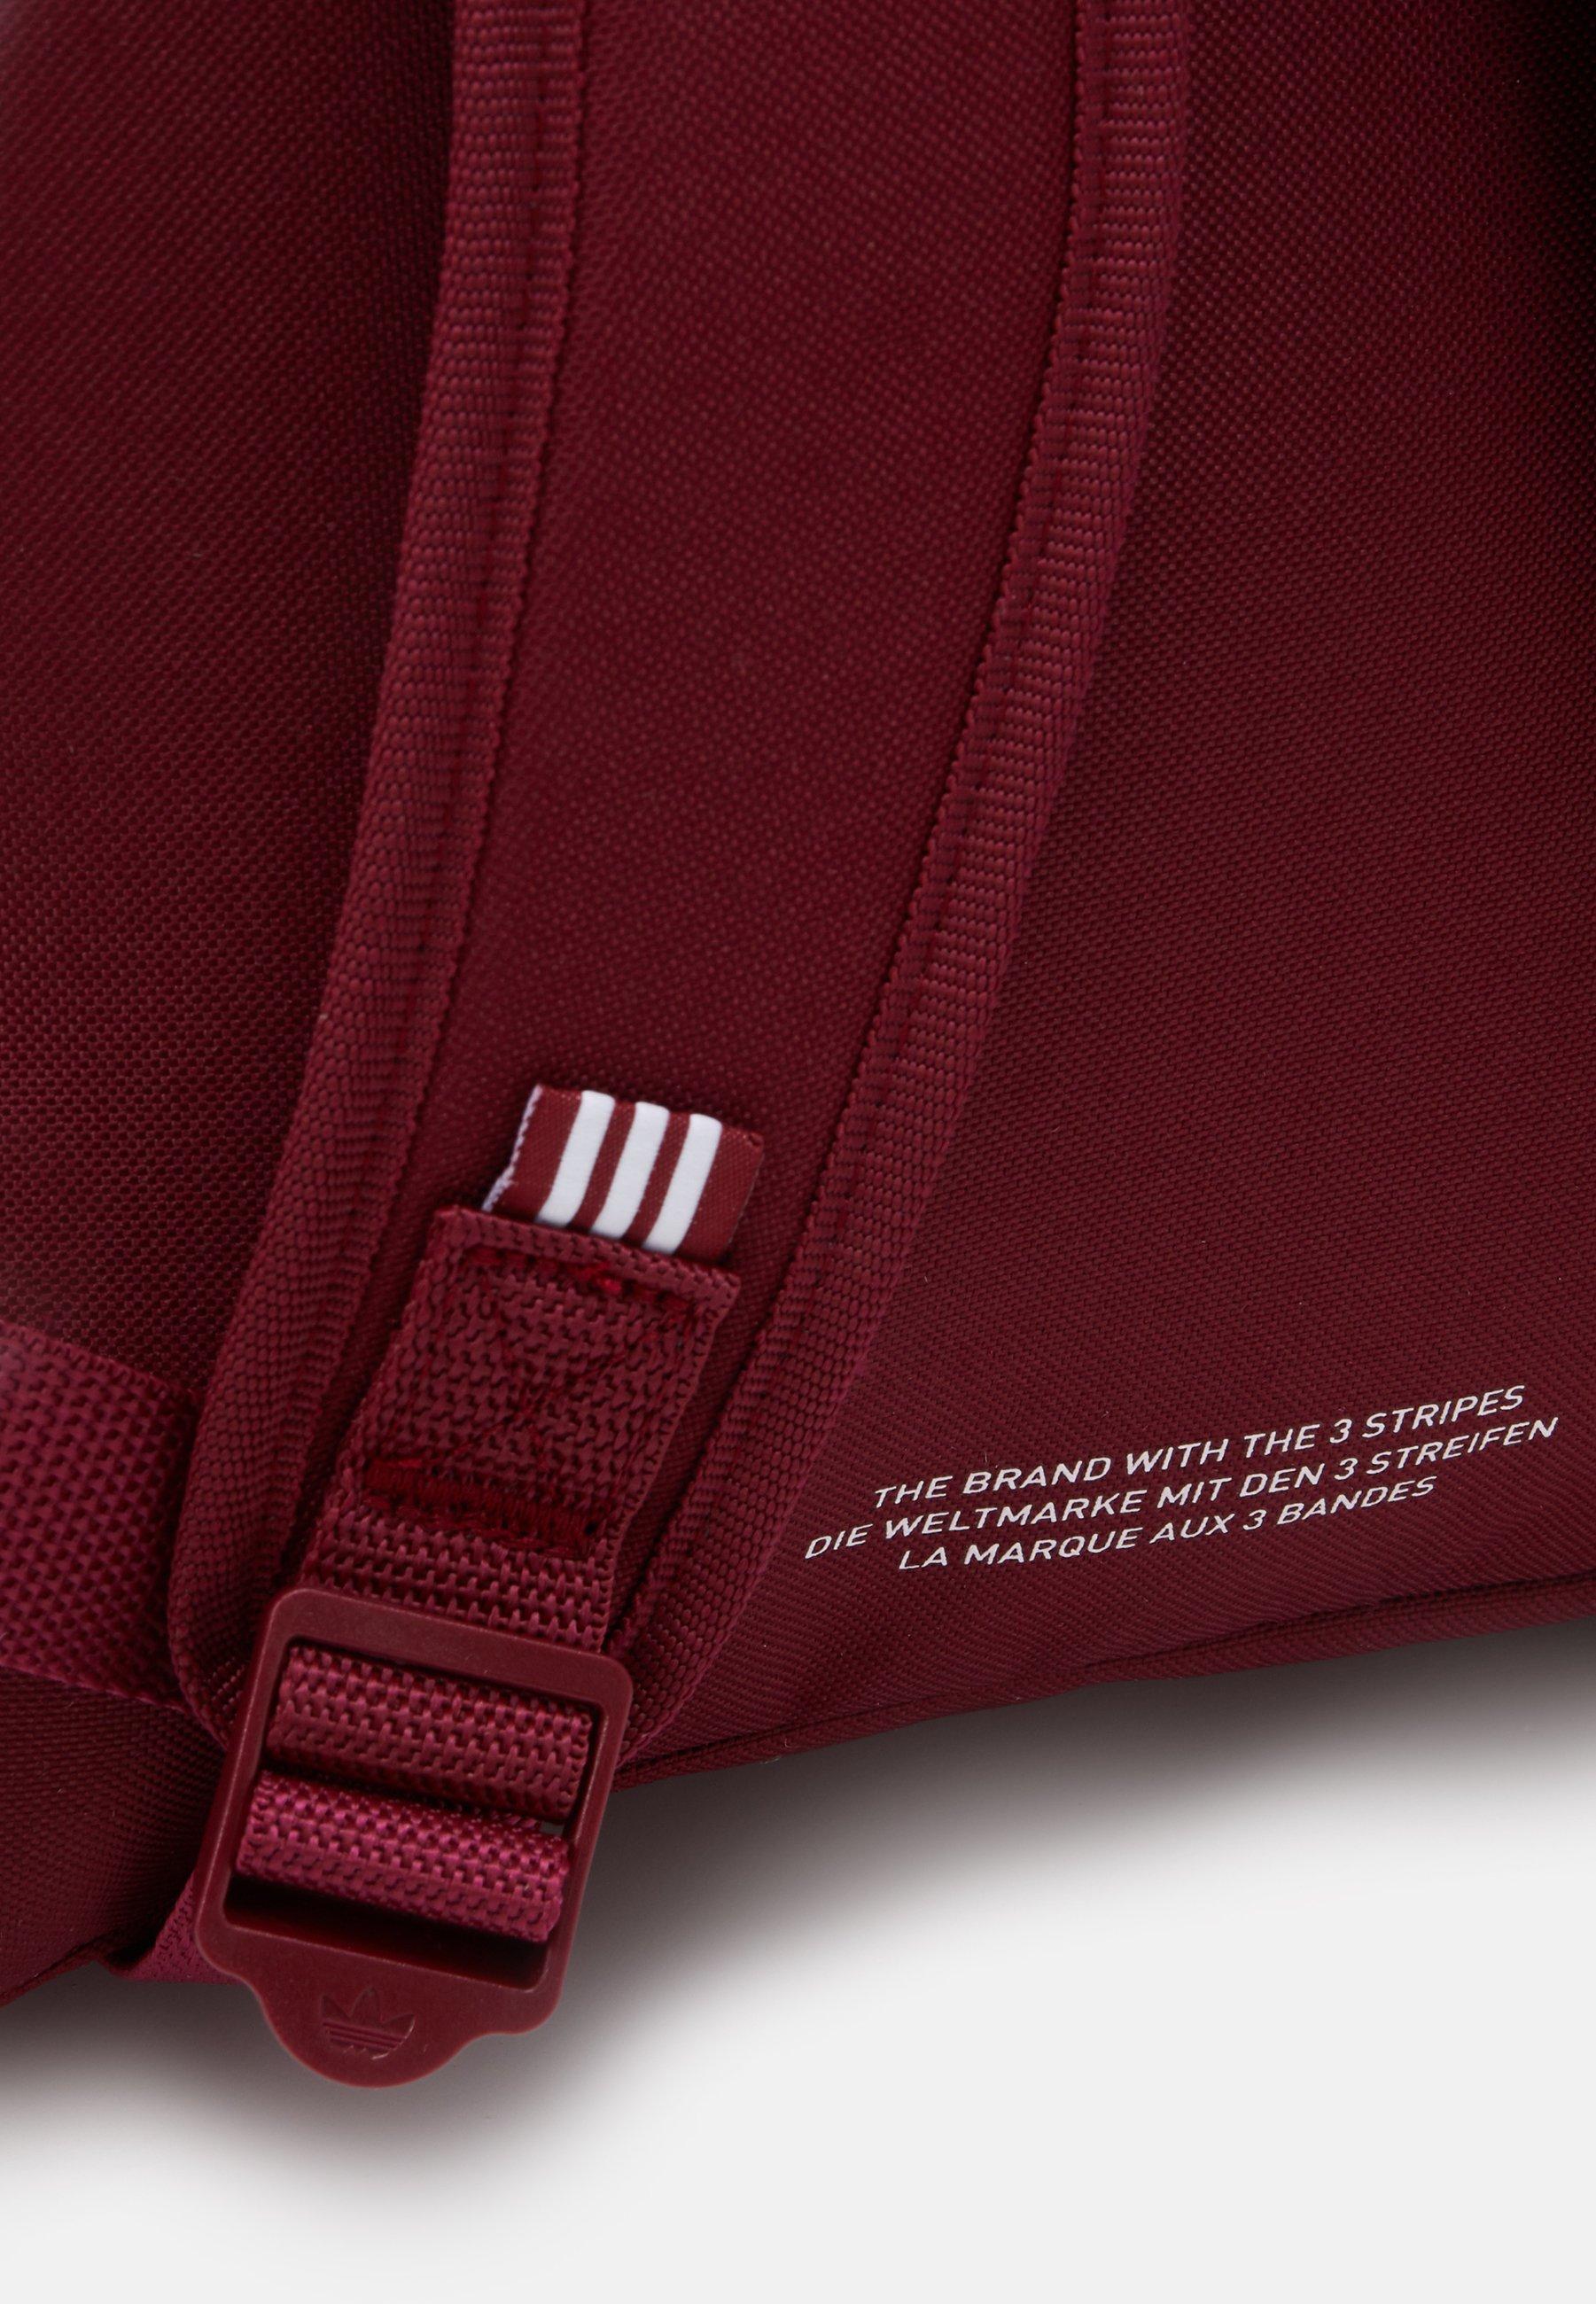 Adidas Originals Classic - Rygsække Bordeaux/white